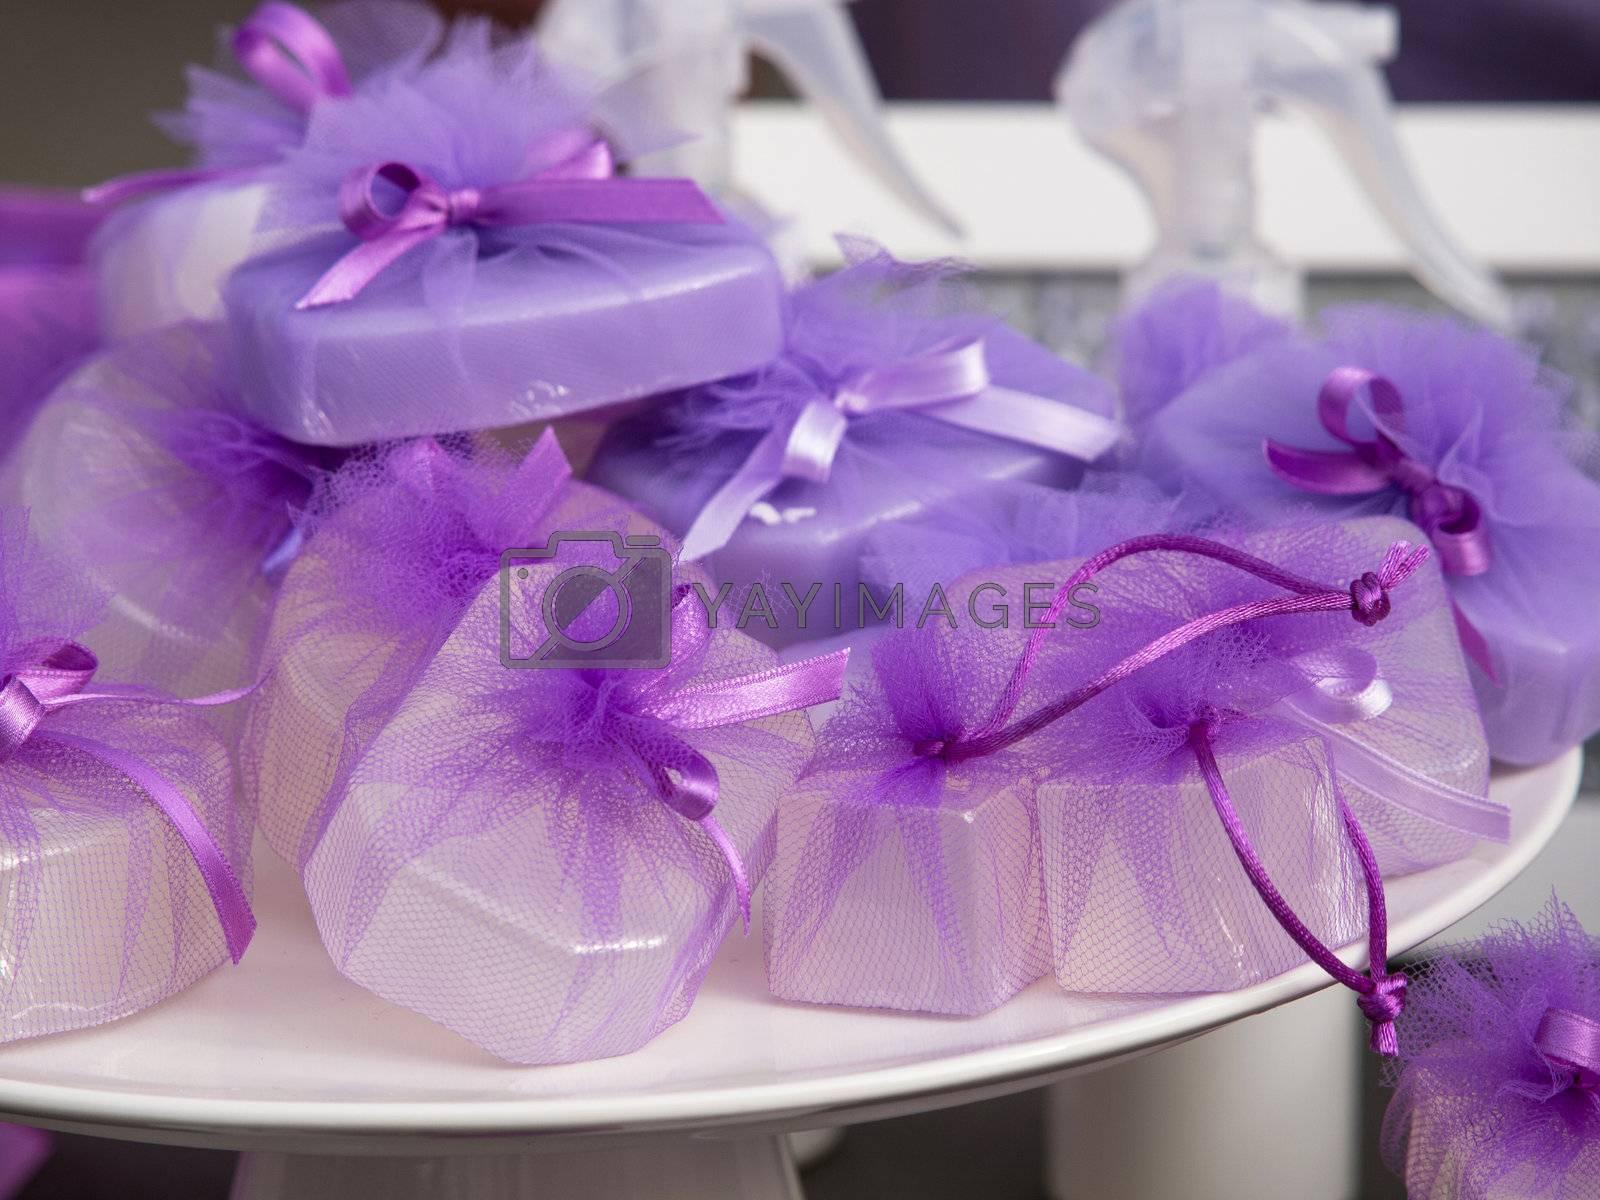 lavender soap on the open market